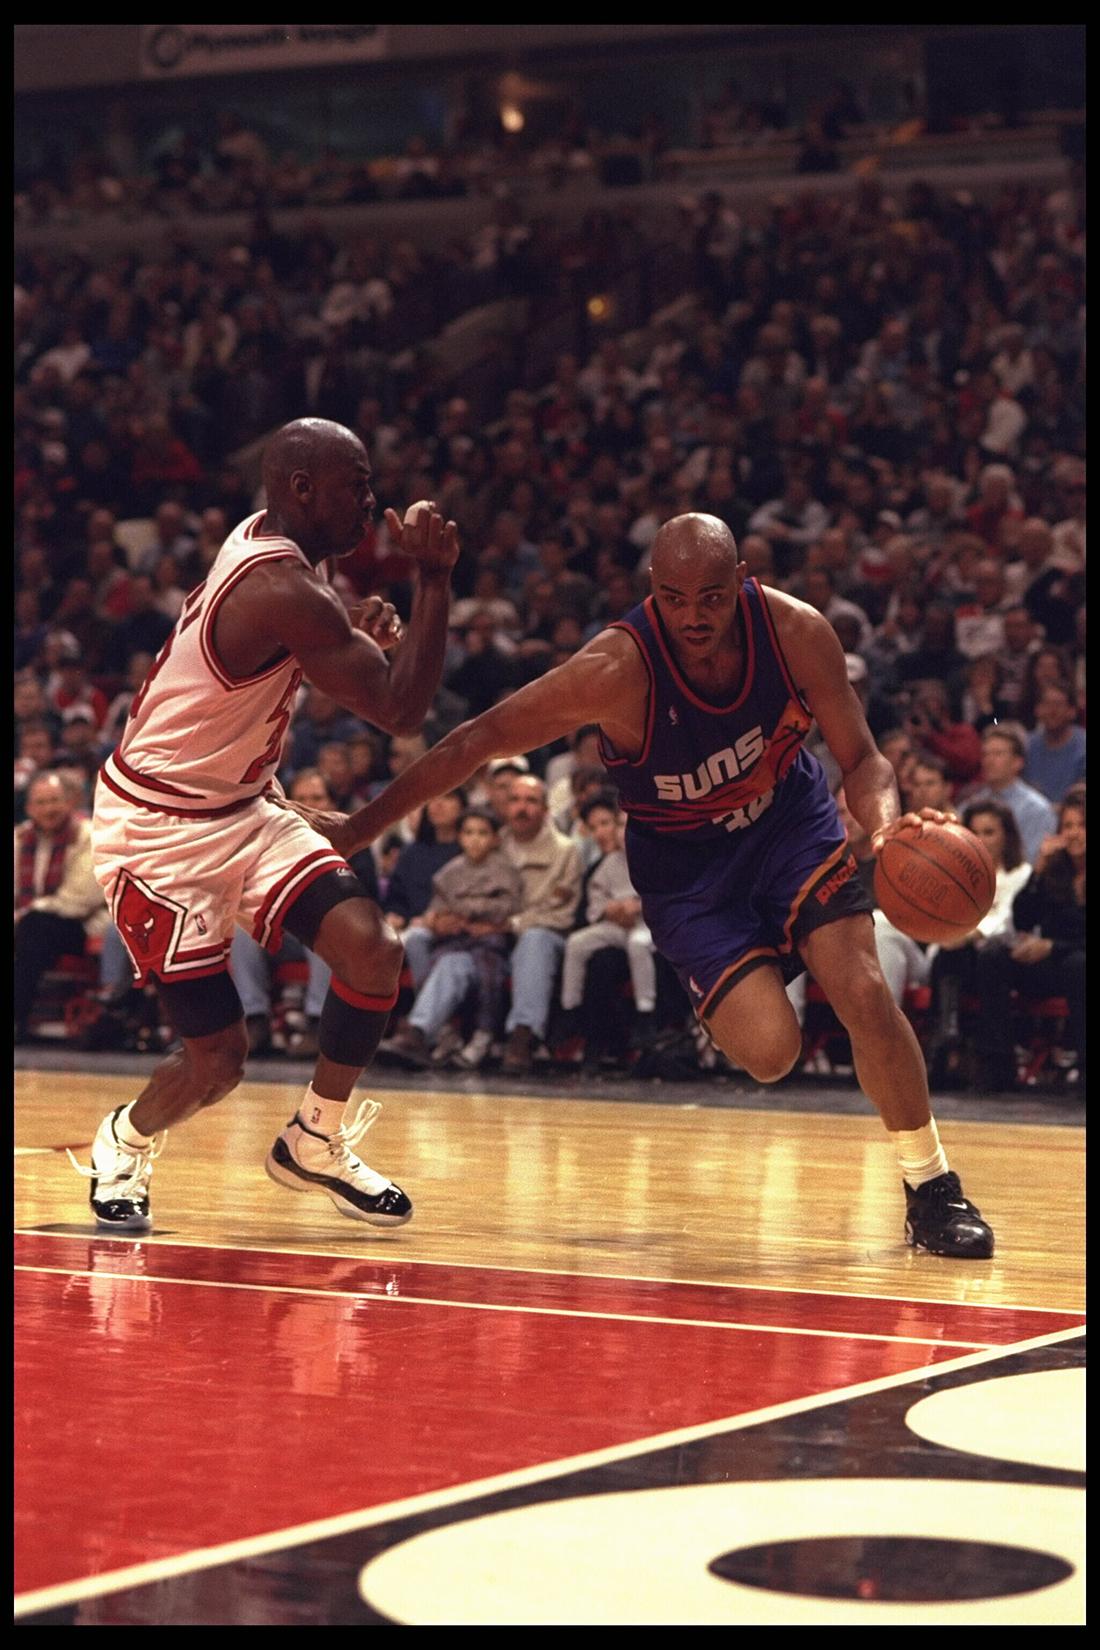 Michael Jordan & Charles Barkley en viva basquet